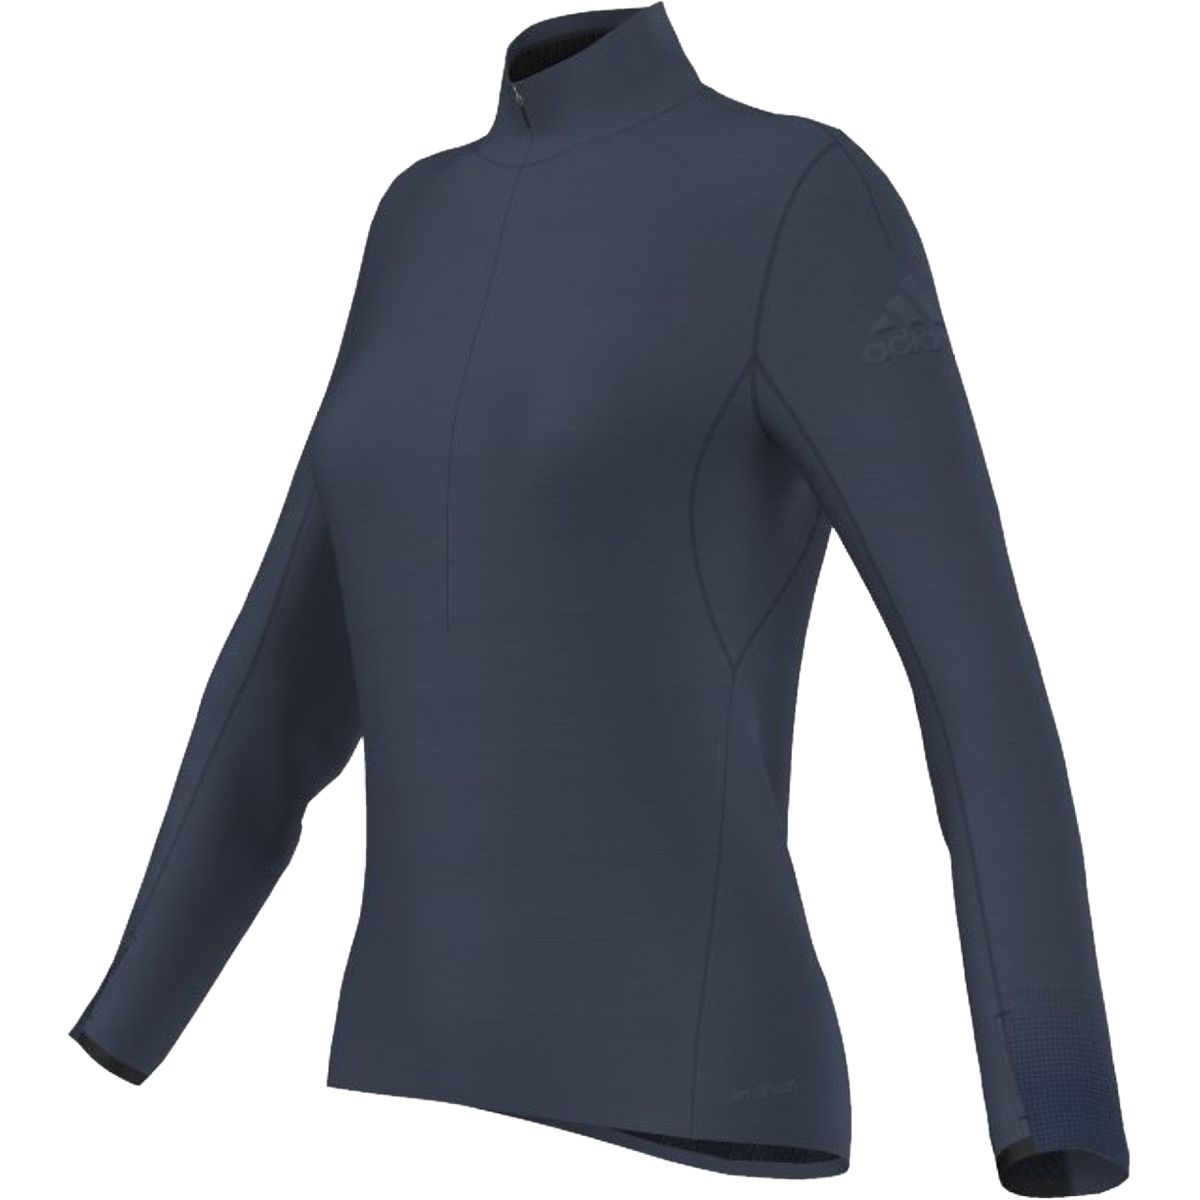 Adidas Climaheat Half-Zip T-Shirt - Women